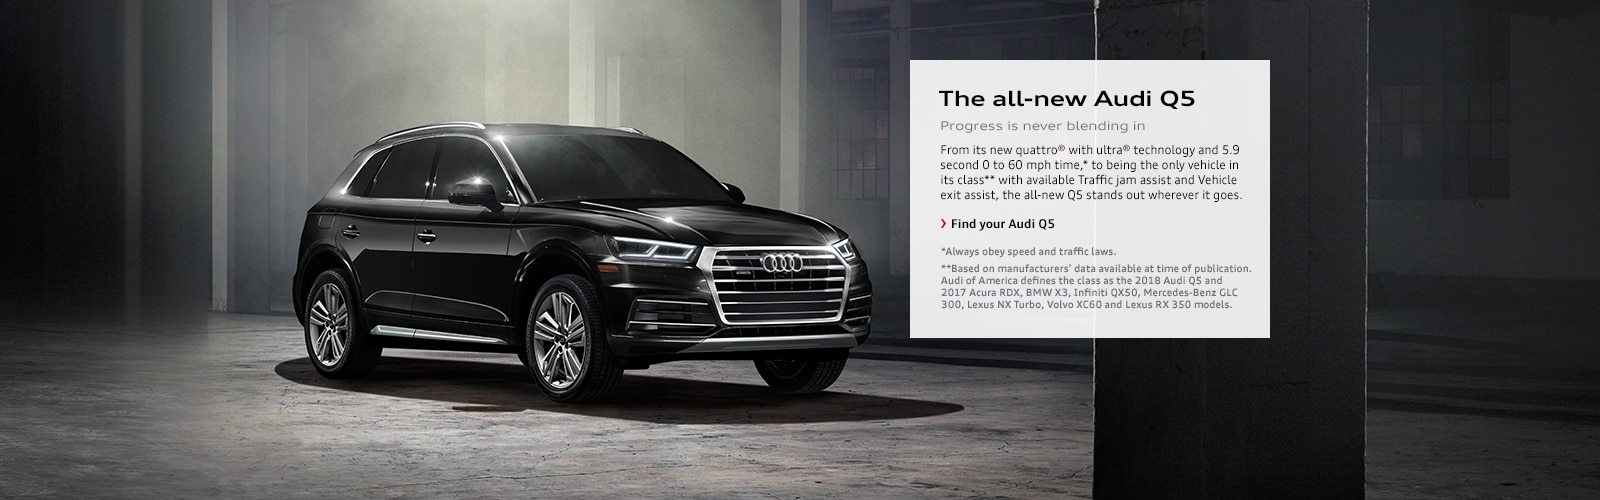 Audi Melbourne New And Used Audi Dealership Audi Lease Specials - Audi dealers florida